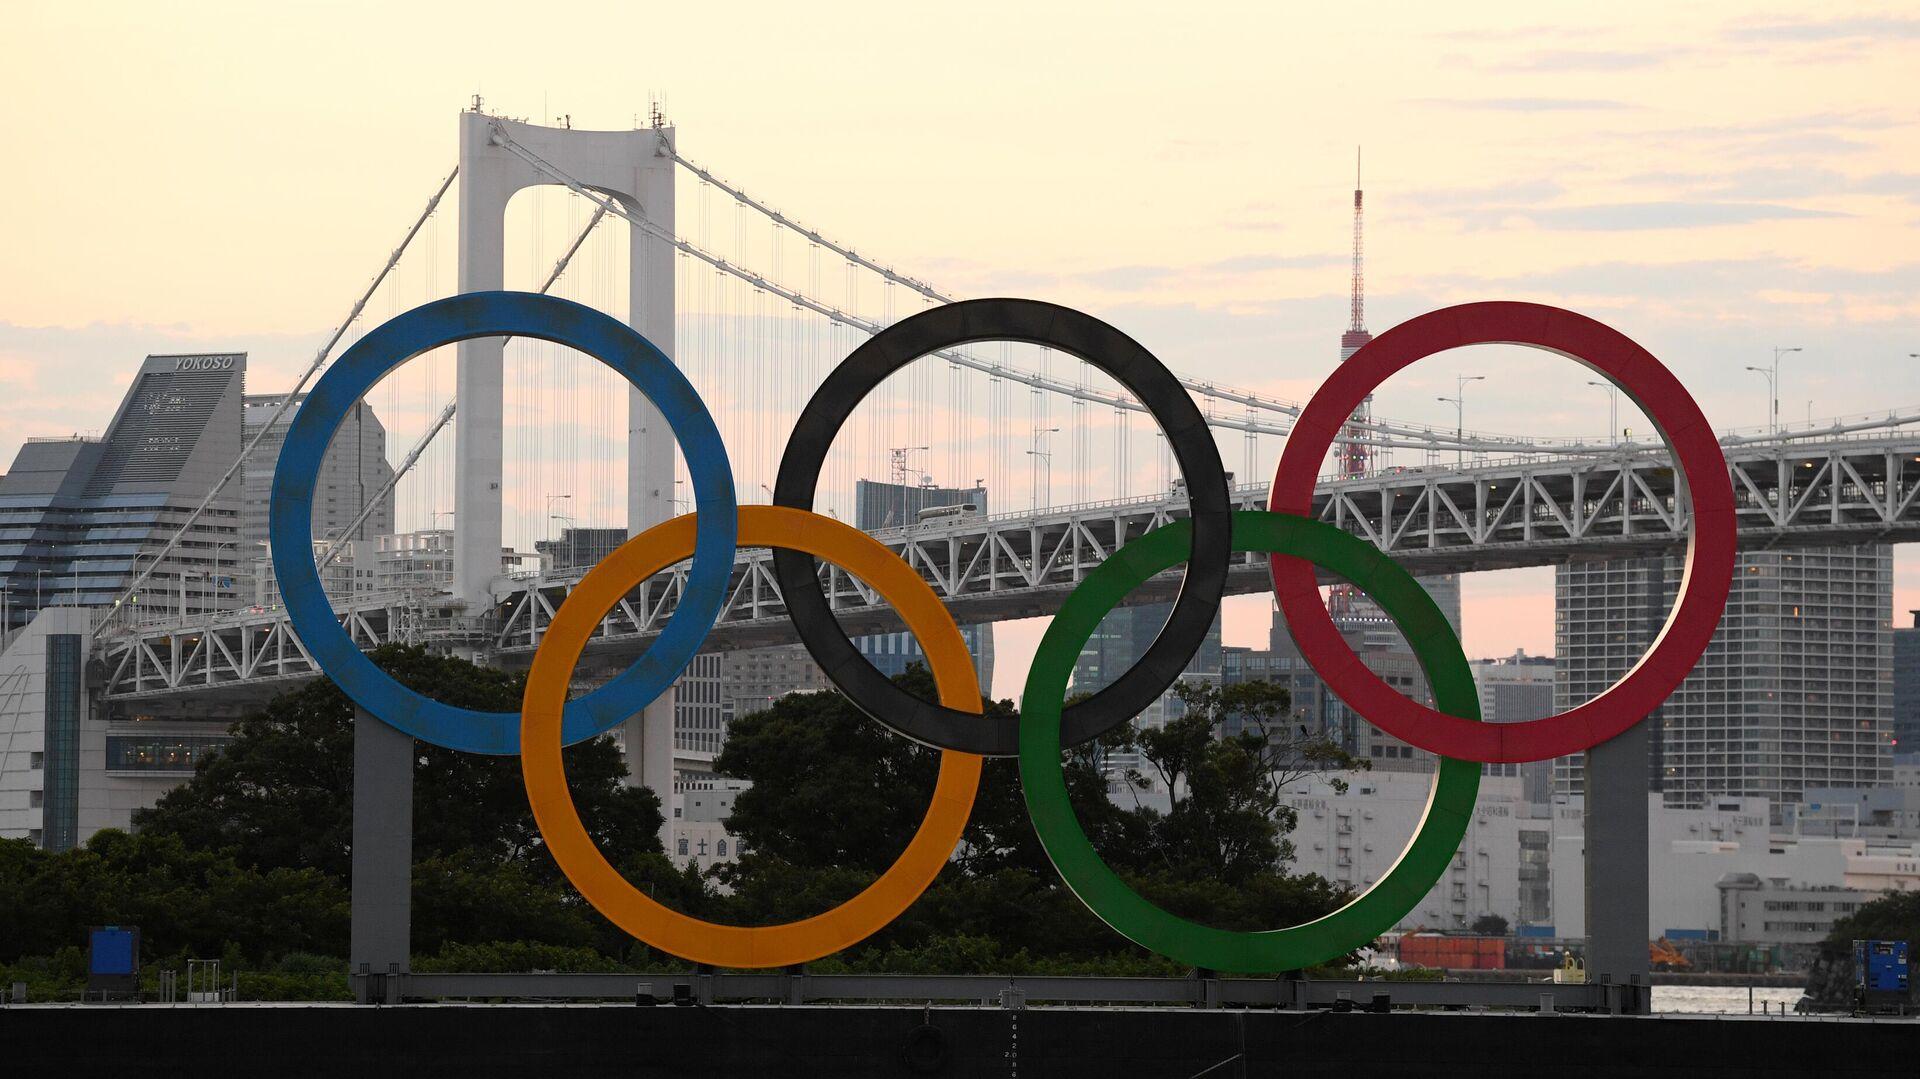 Токио накануне открытия Олимпийских игр - РИА Новости, 1920, 05.08.2021